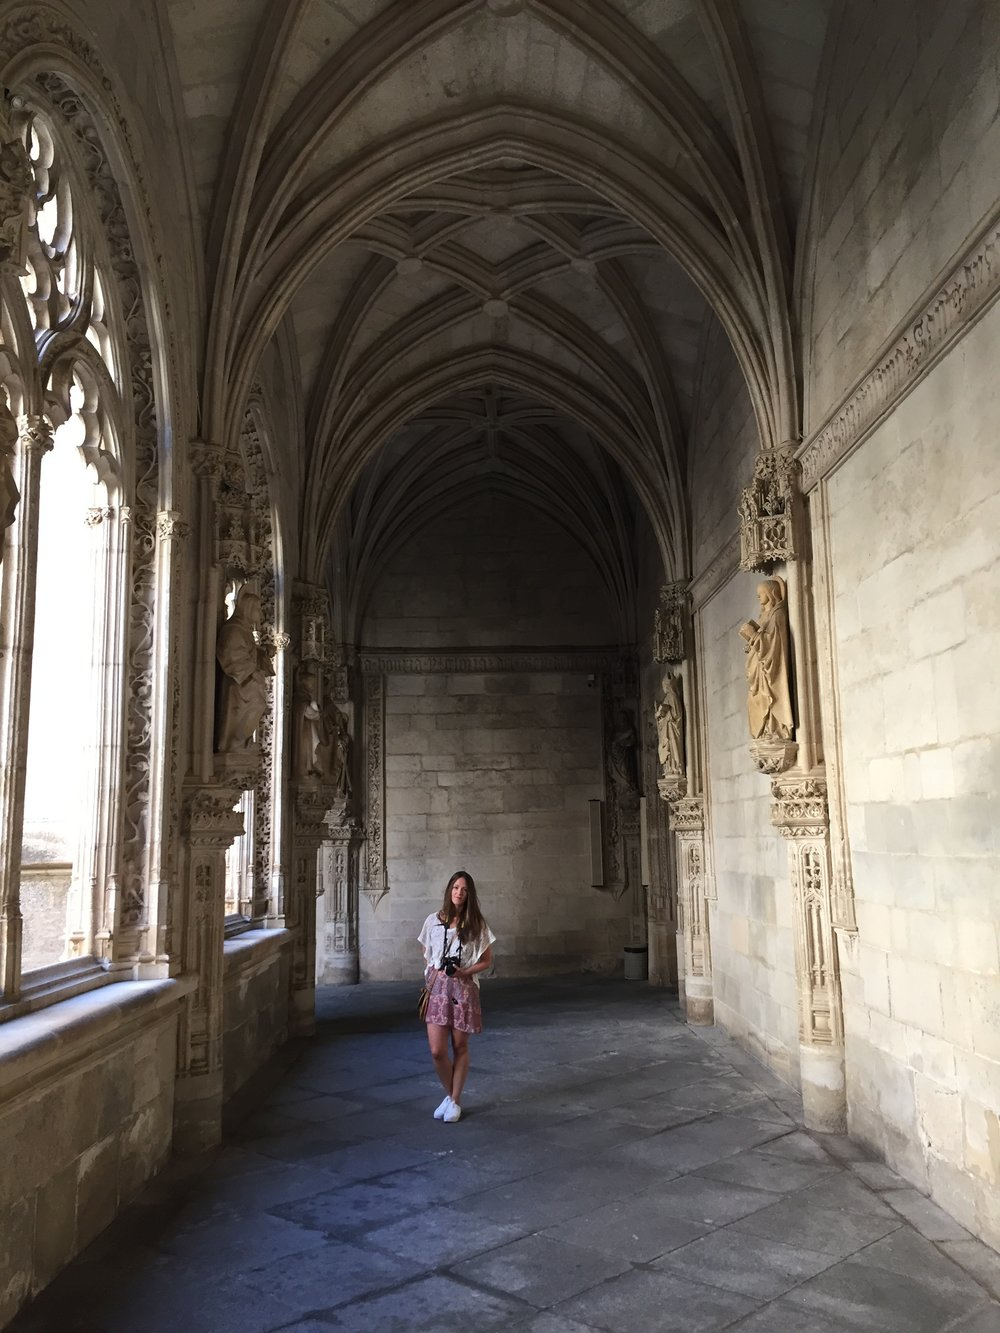 Wandering the beautiful halls of the Monastery of San Juan de los Reyes